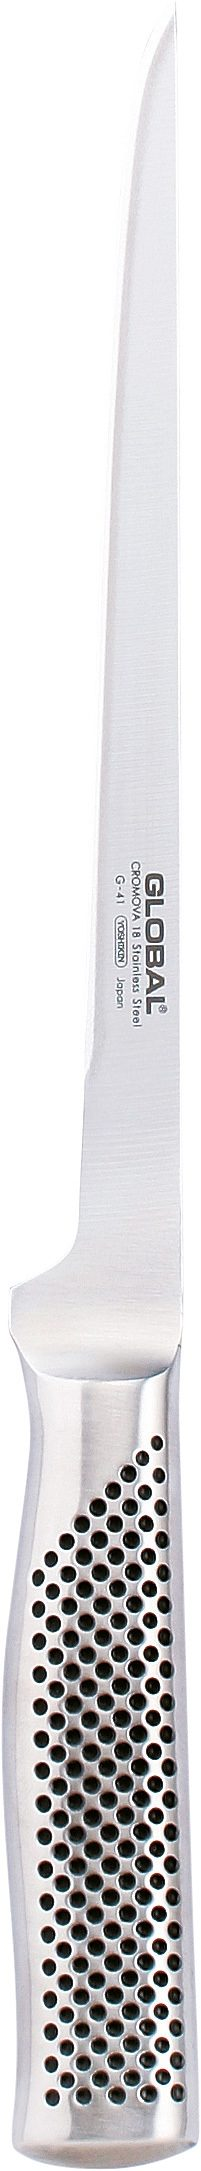 GLOBAL G-41 Filetiermesser